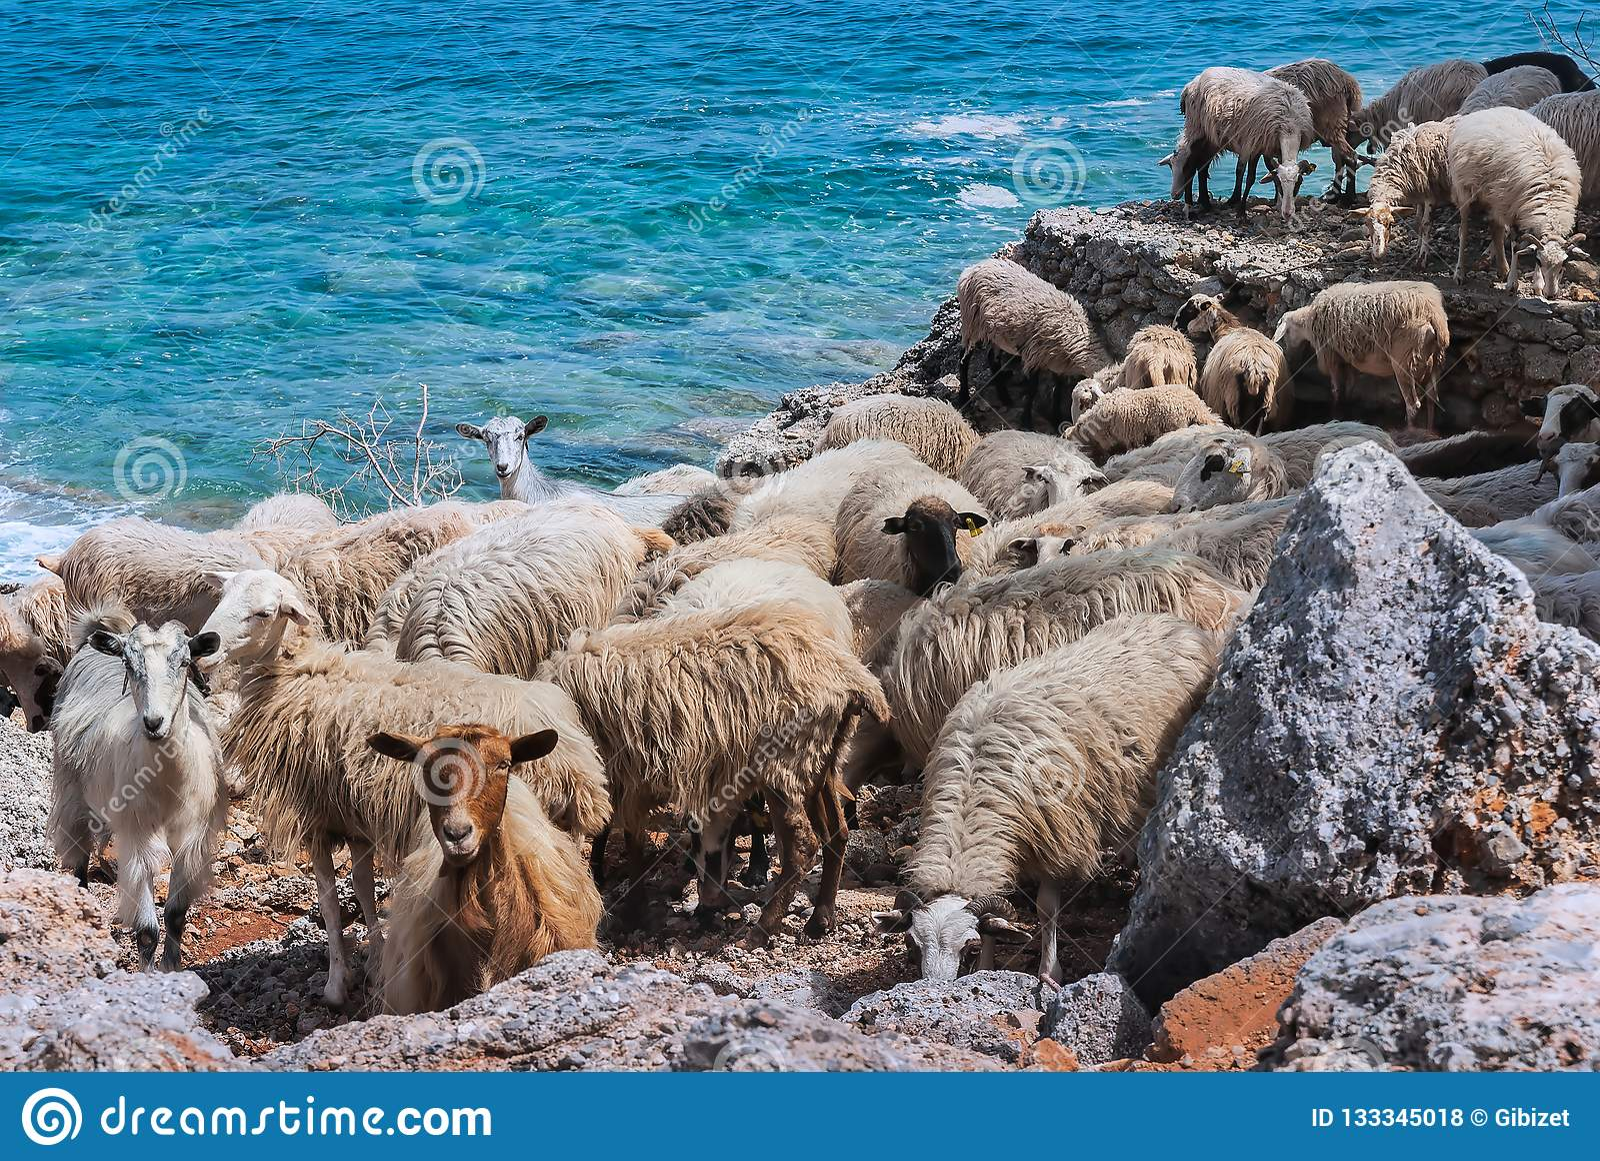 Cretan sheep by the sea